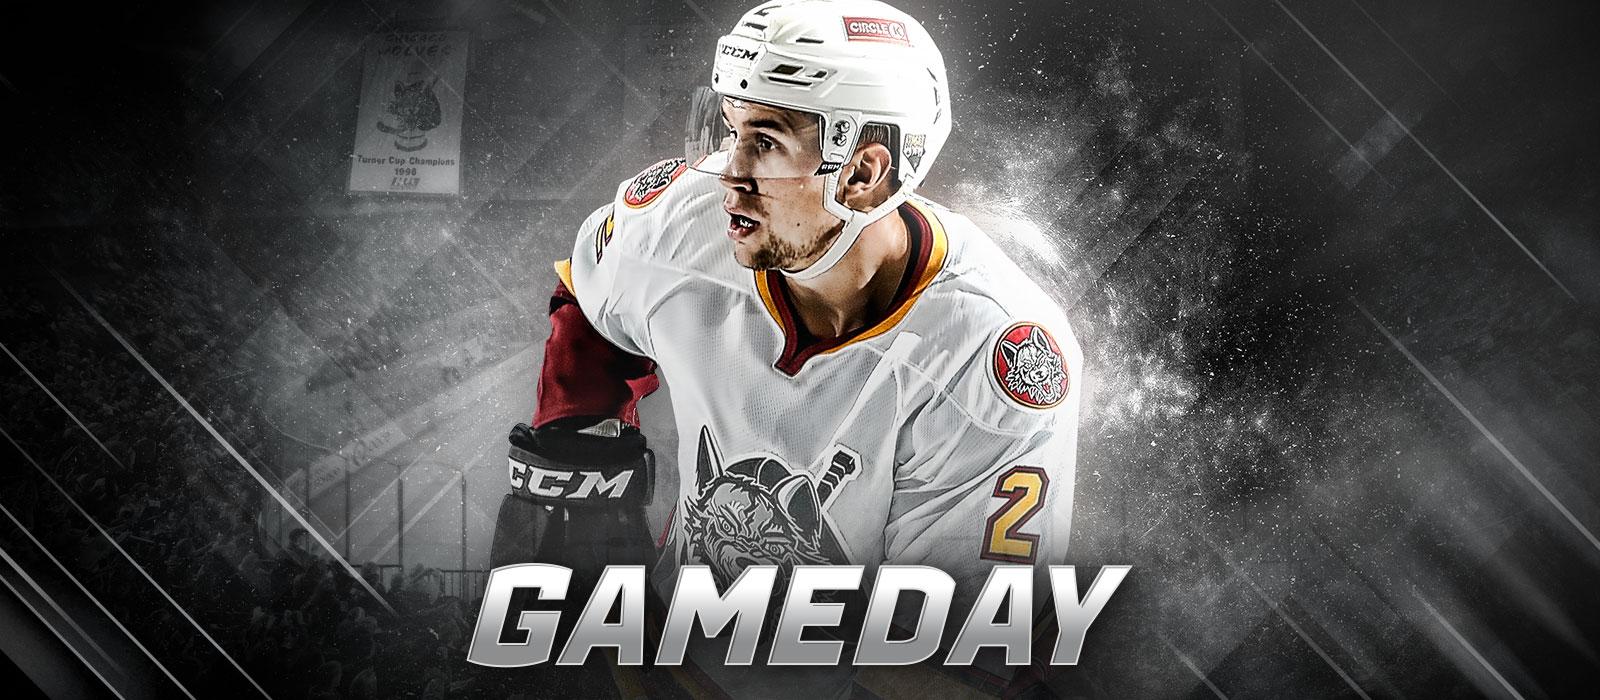 Gameday-header-2